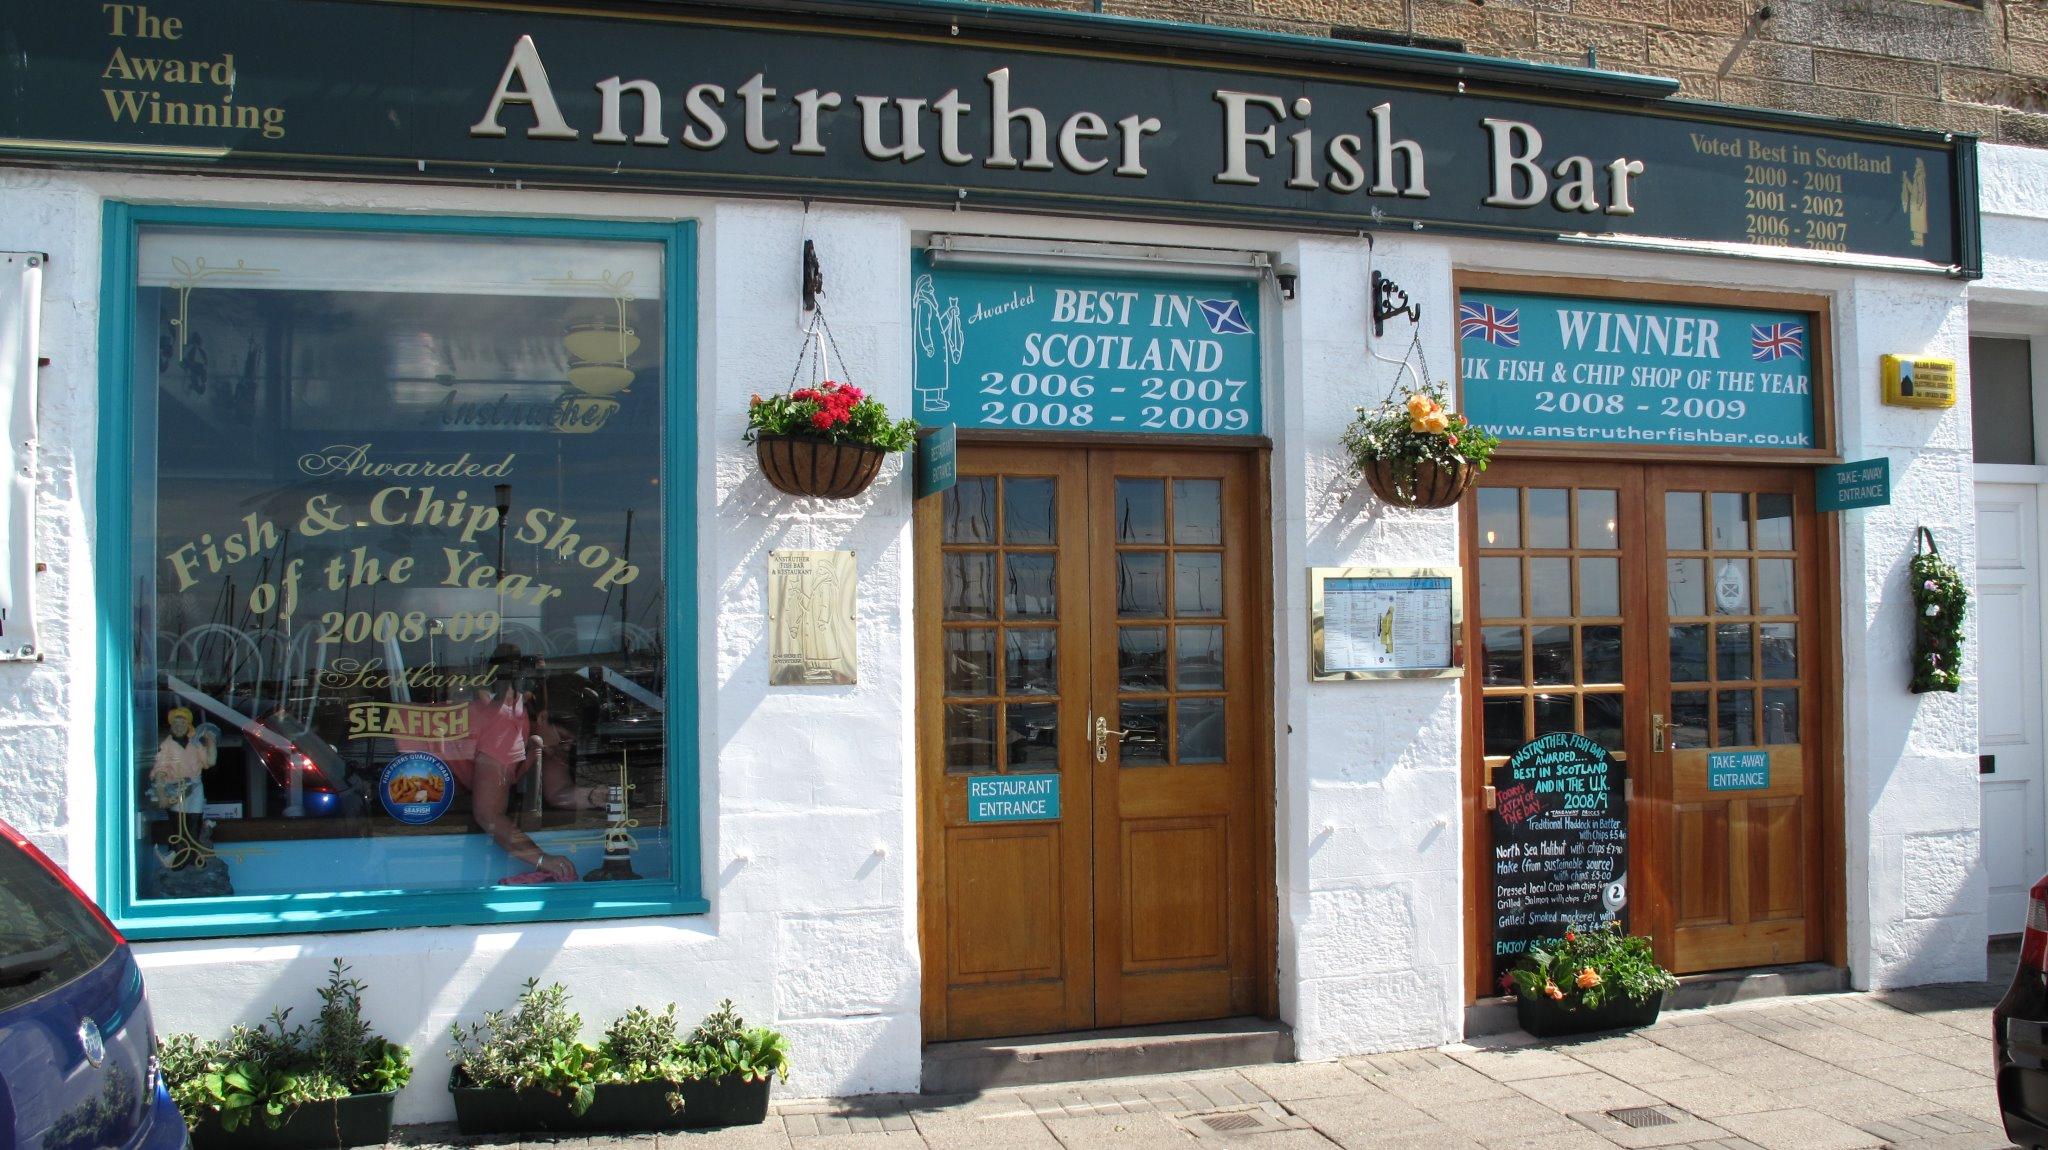 Anstruther Fish Bar, Fife